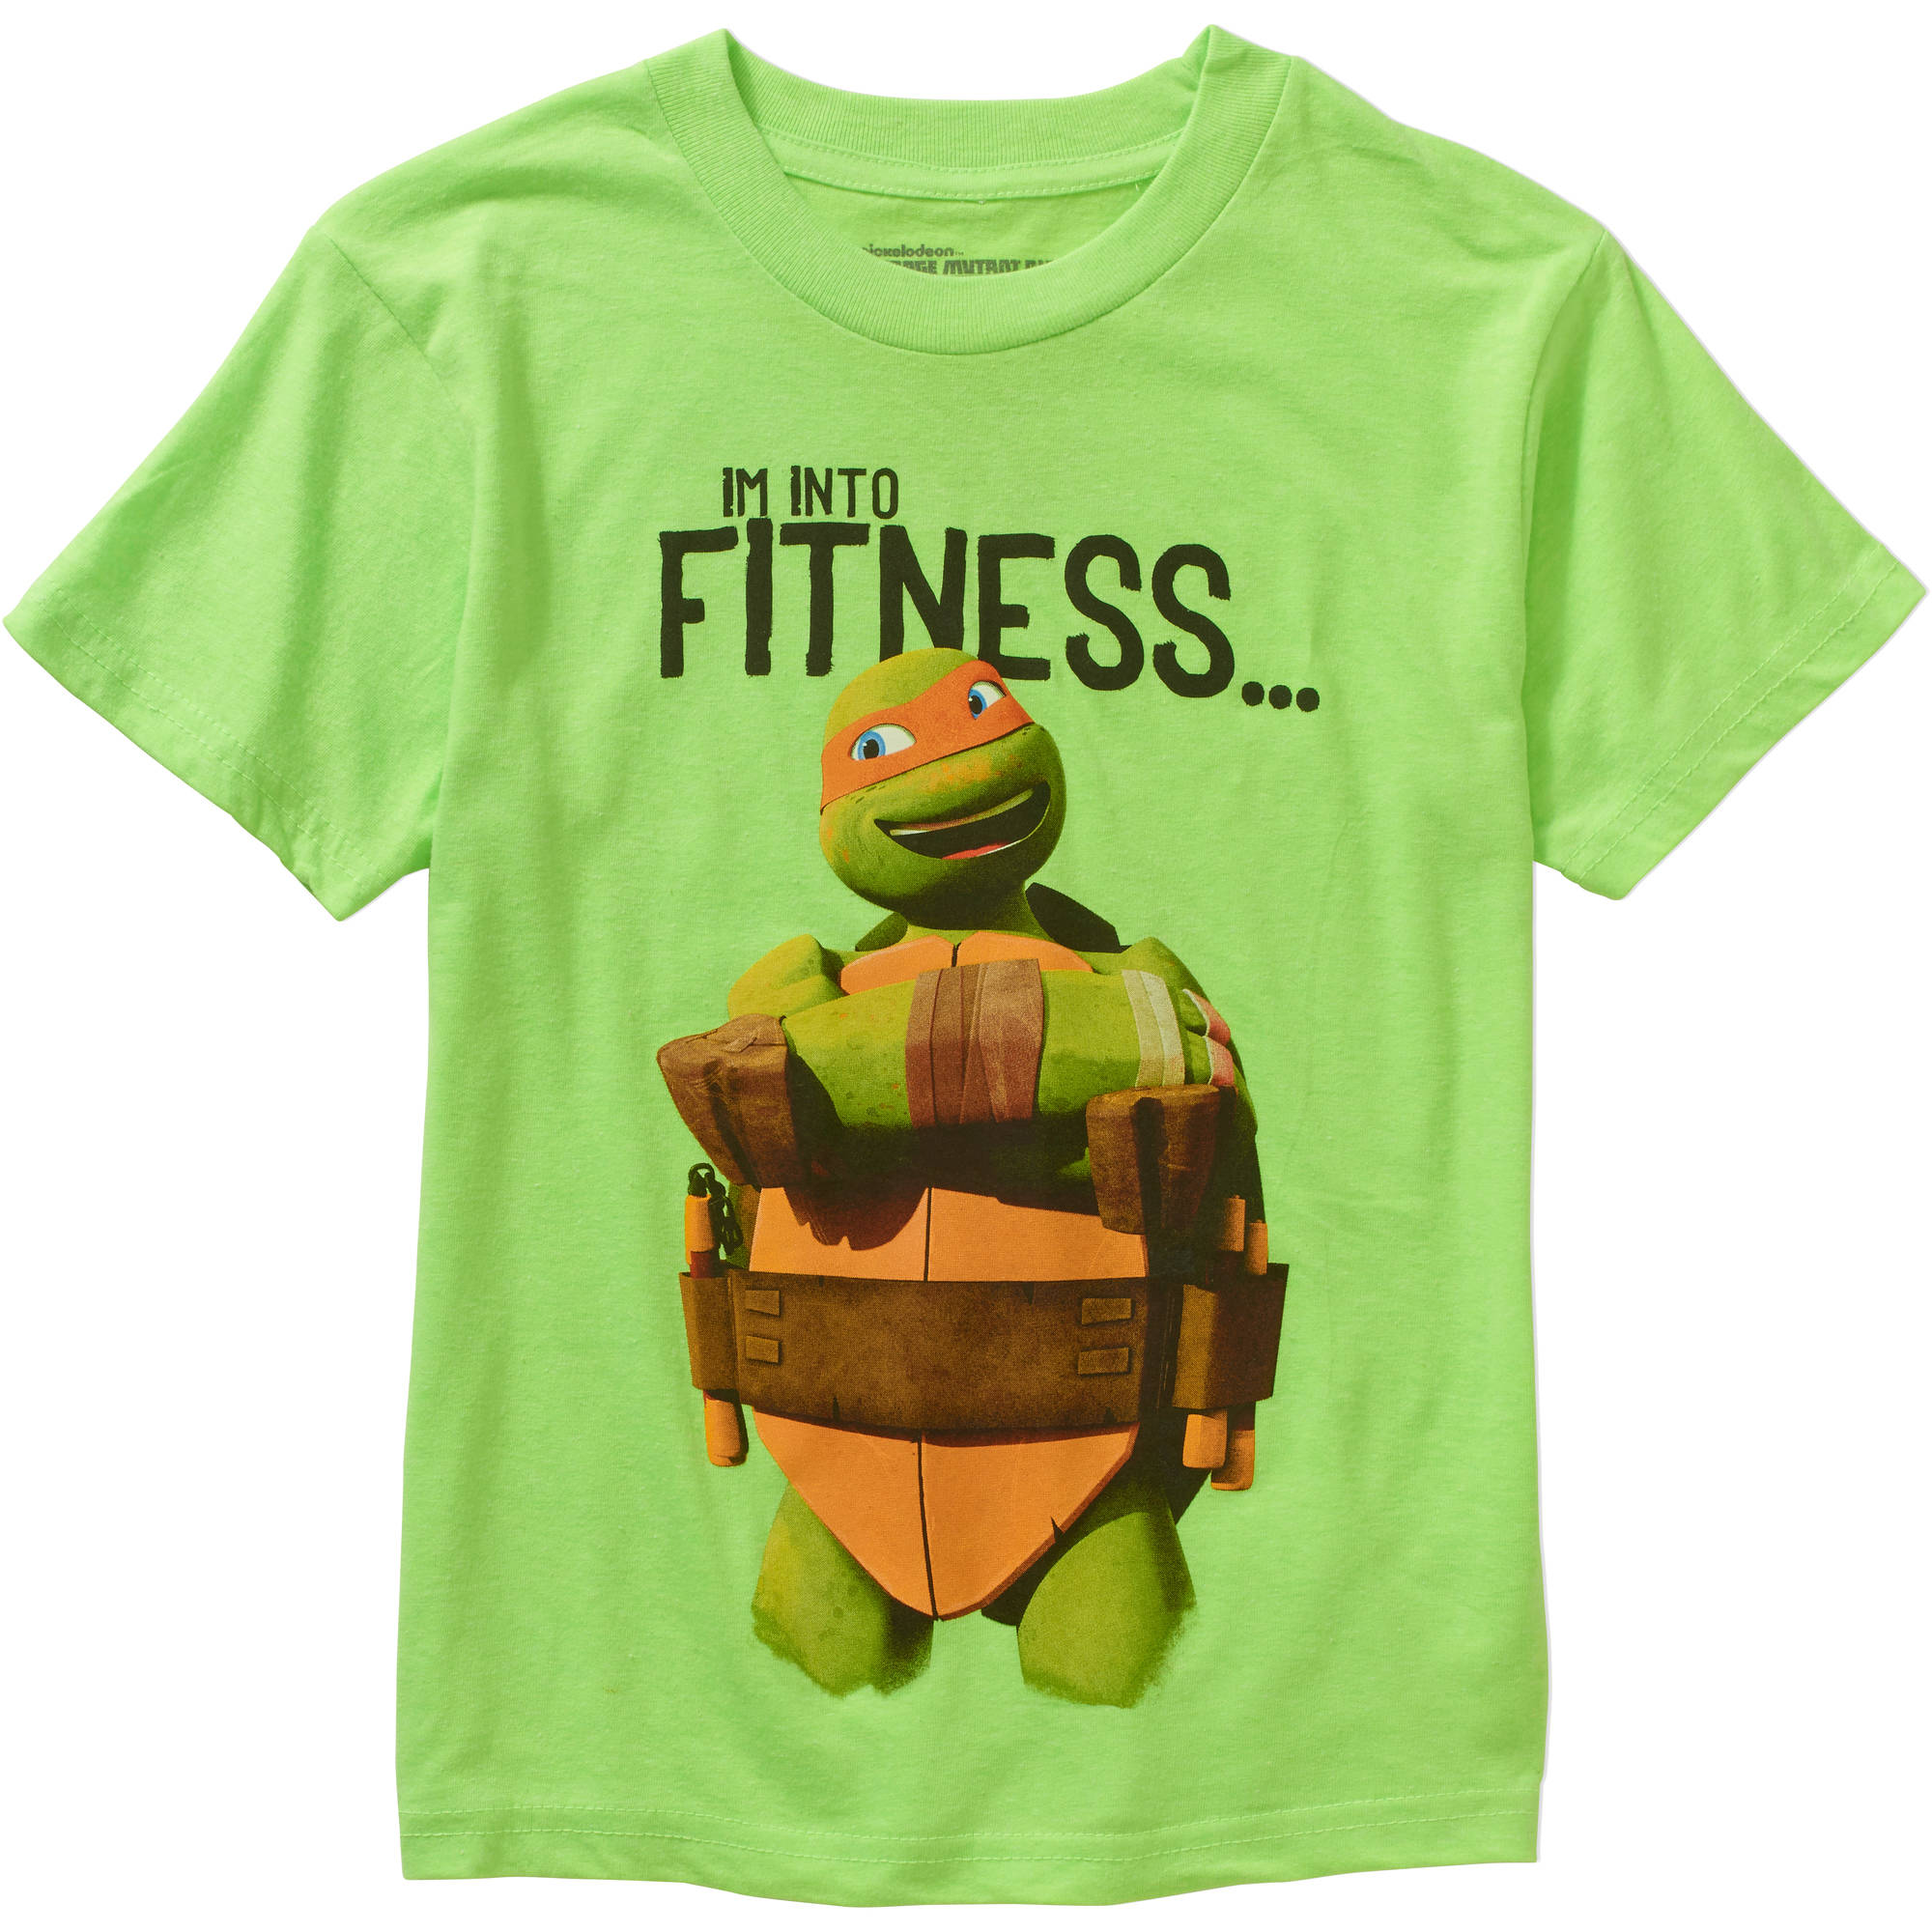 NEW Boys TMNT Tank Top Size 7 T-Shirt Teenage Mutant Ninja Turtles Movie Hero